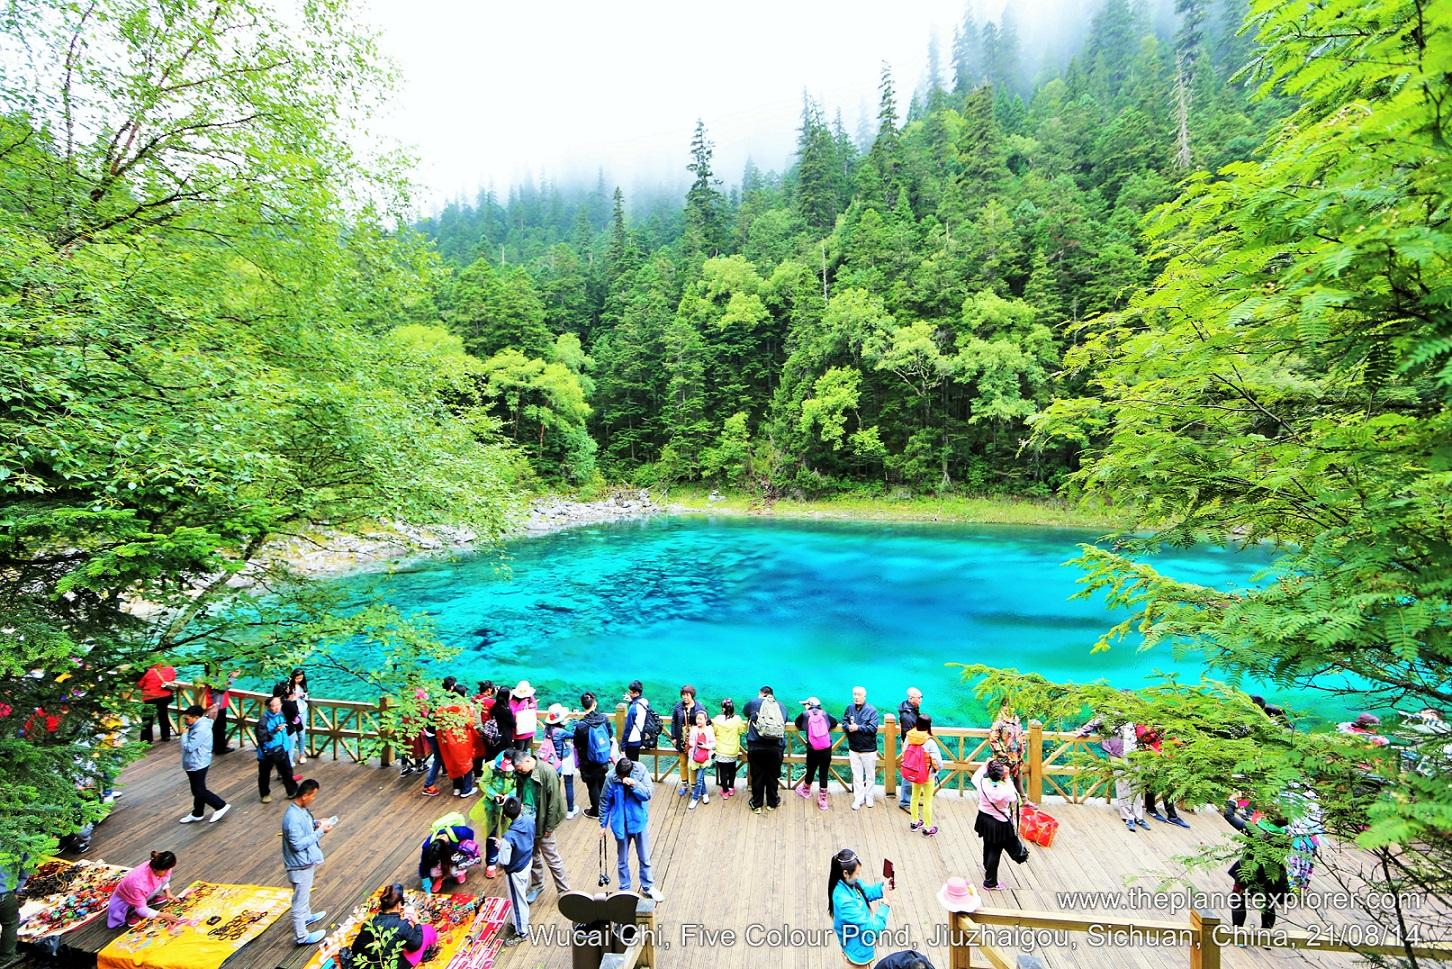 2014-08-21_1121_china_sichuan_jiuzhaigou_five-colour-pond-wucai-chi_lr_nw